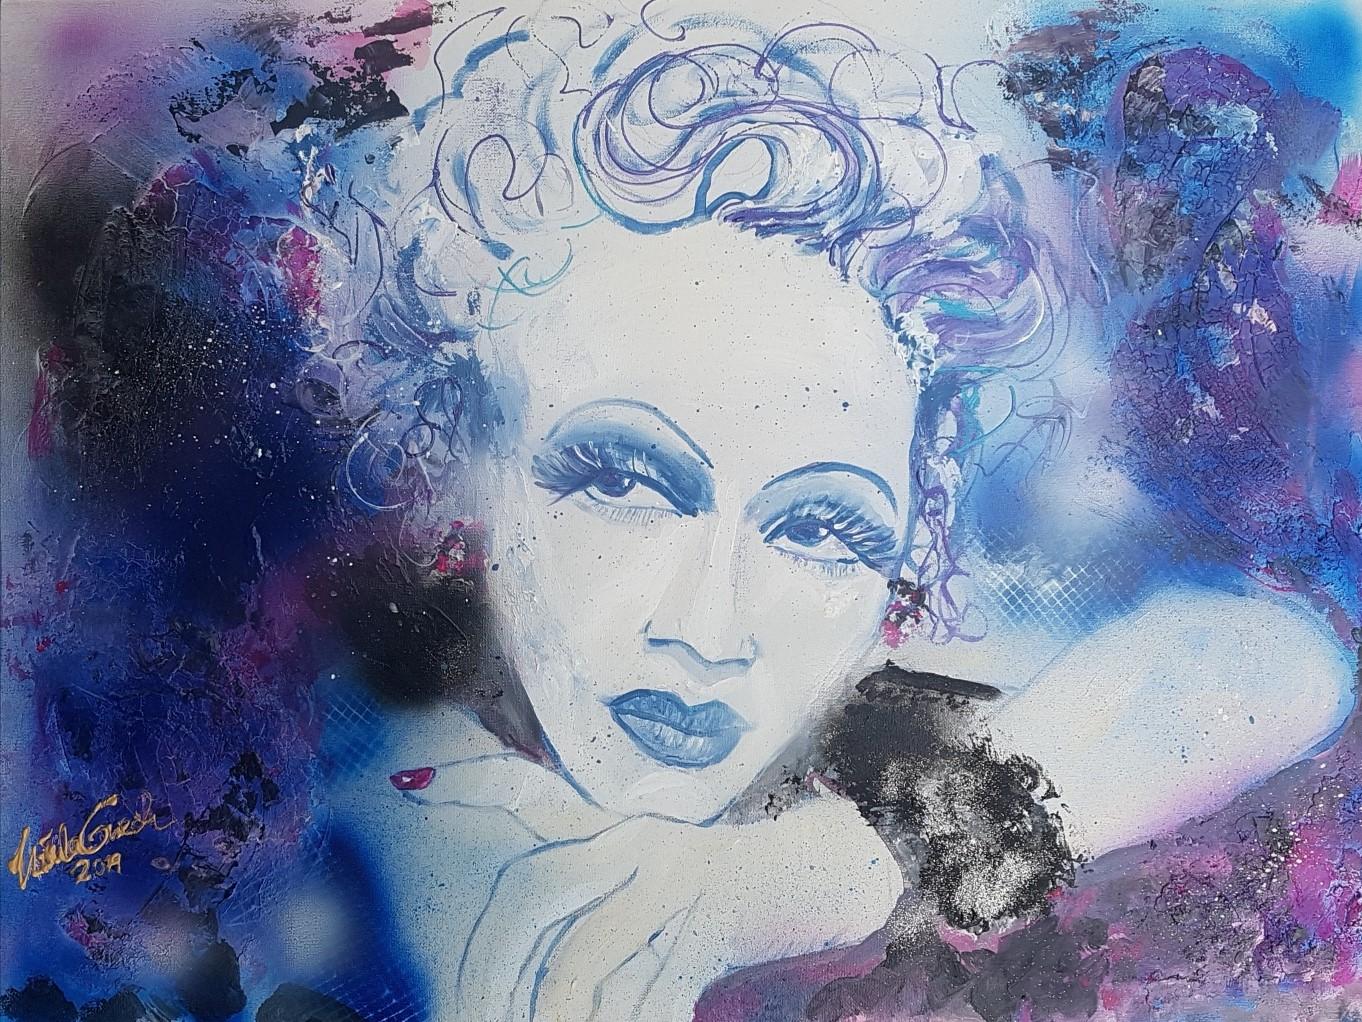 Marlene Dietrich forever  auf Leinwand (Technik: Acryl/Mixed Media) 60 X 80 cm) ,